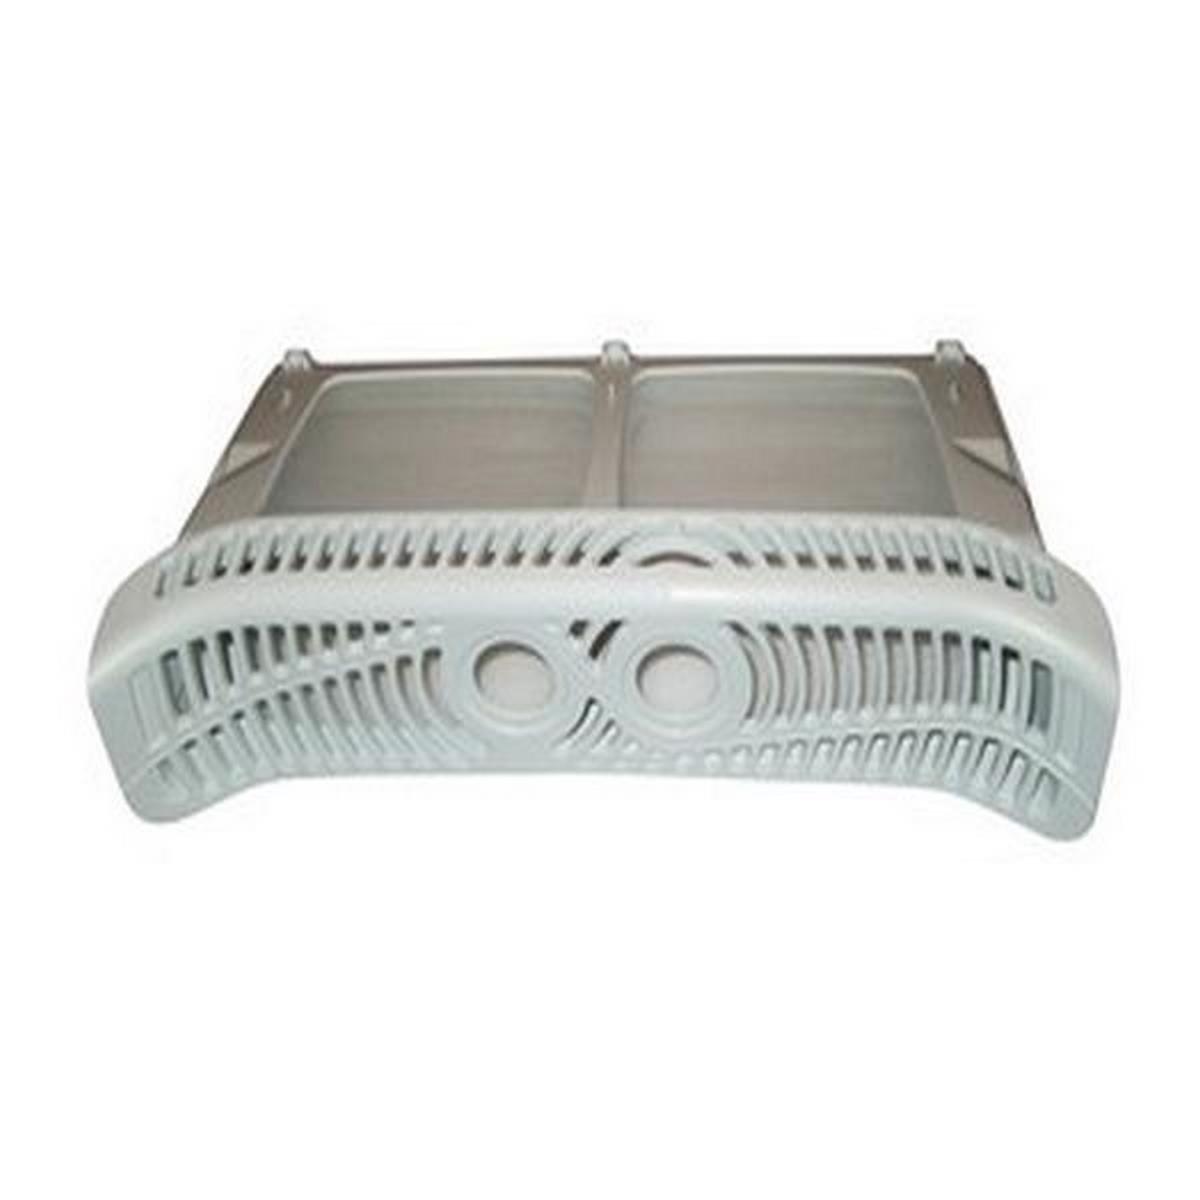 Filter/ /Ariston Hotpoint Tumble Dryer Drum